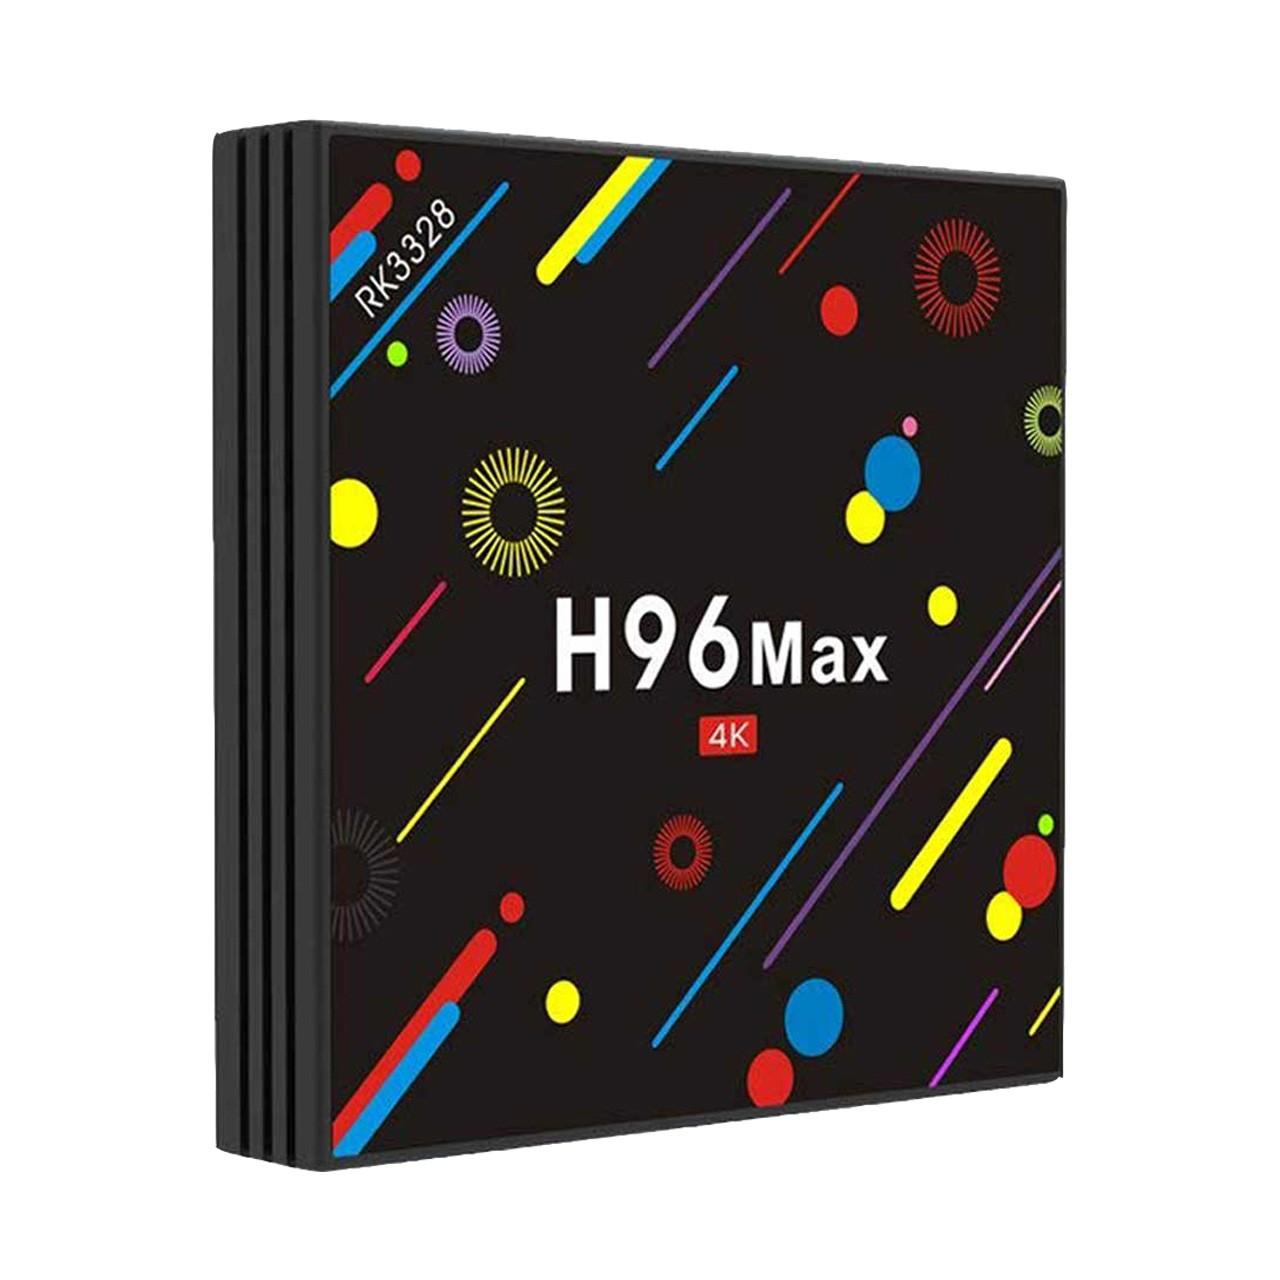 مینی کامپیوتر اندروید H96 MAX 4K سری H2